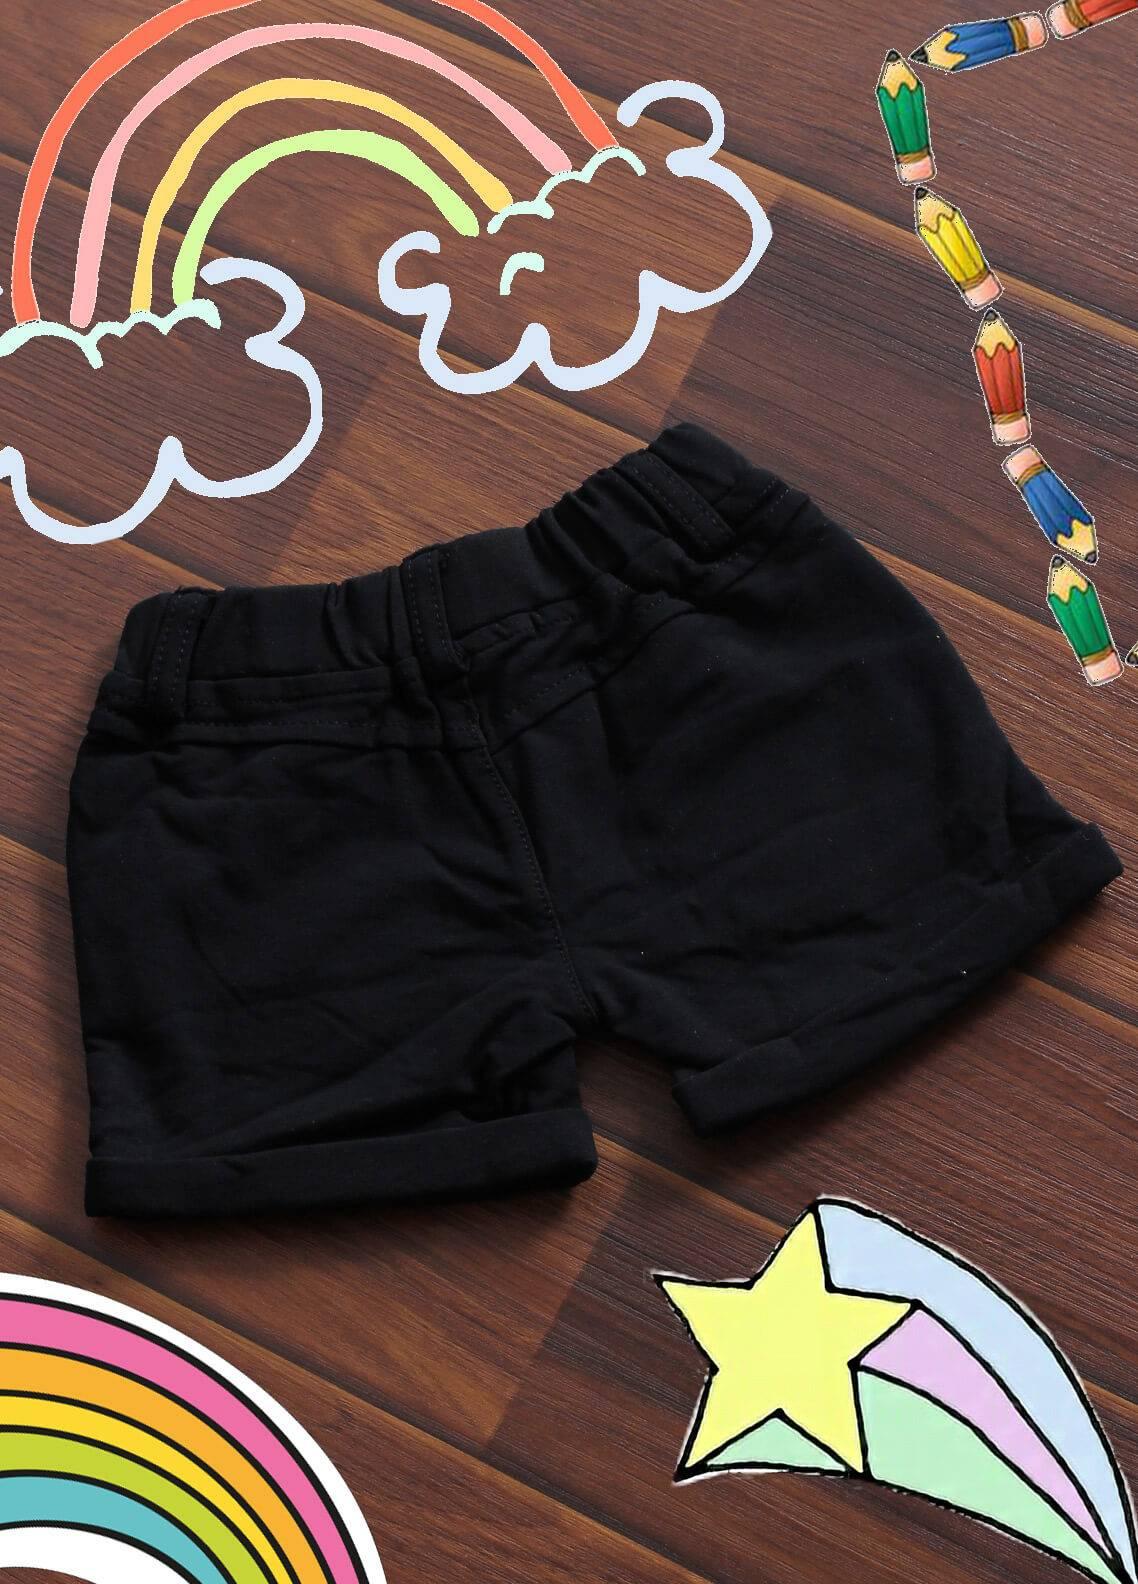 Sanaulla Exclusive Range Denim Casual Shorts for Boys -  19020 Black